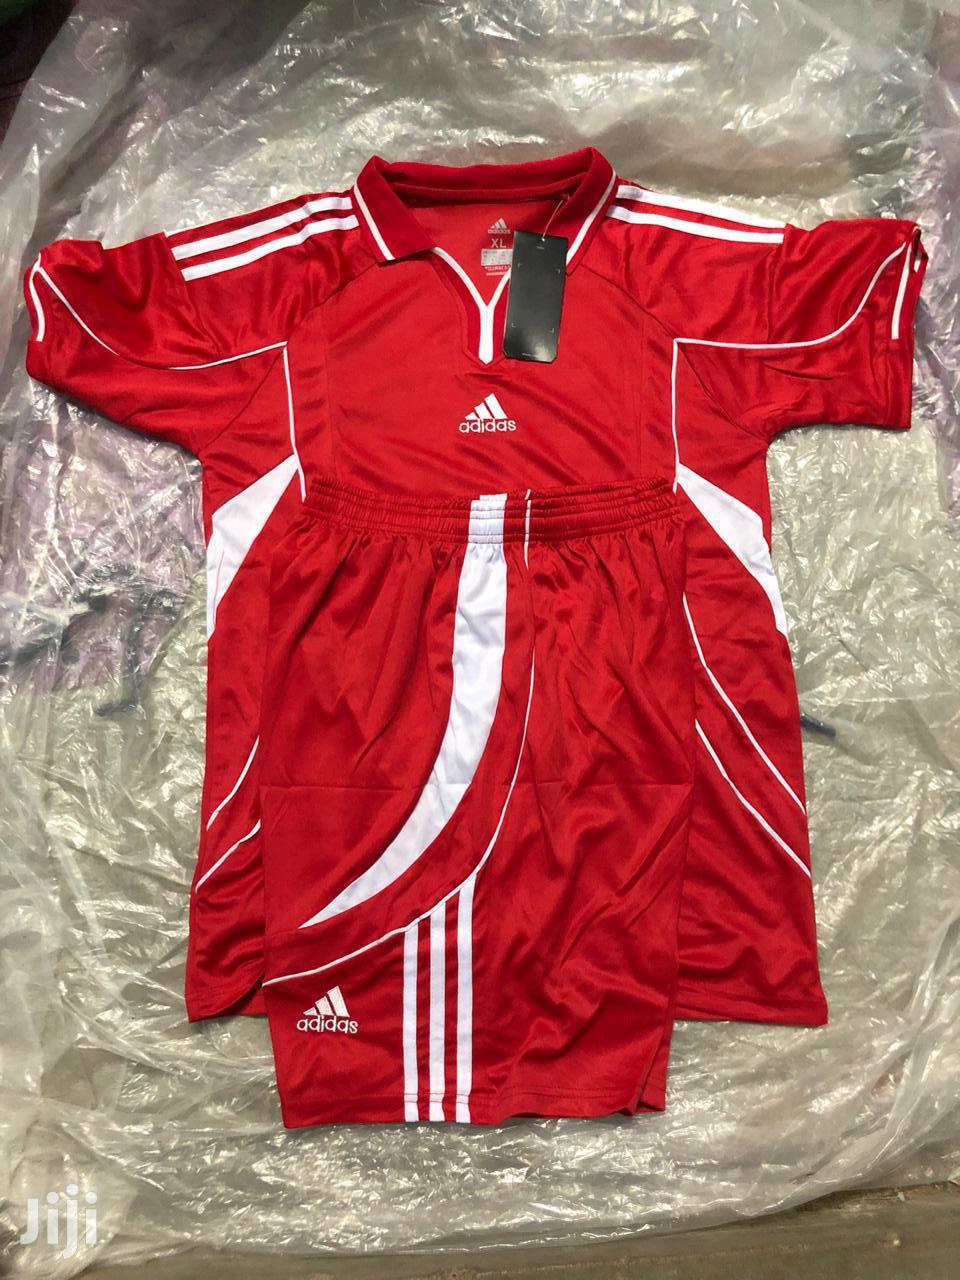 Full KIT Plain Jerseys | Sports Equipment for sale in Kampala, Central Region, Uganda